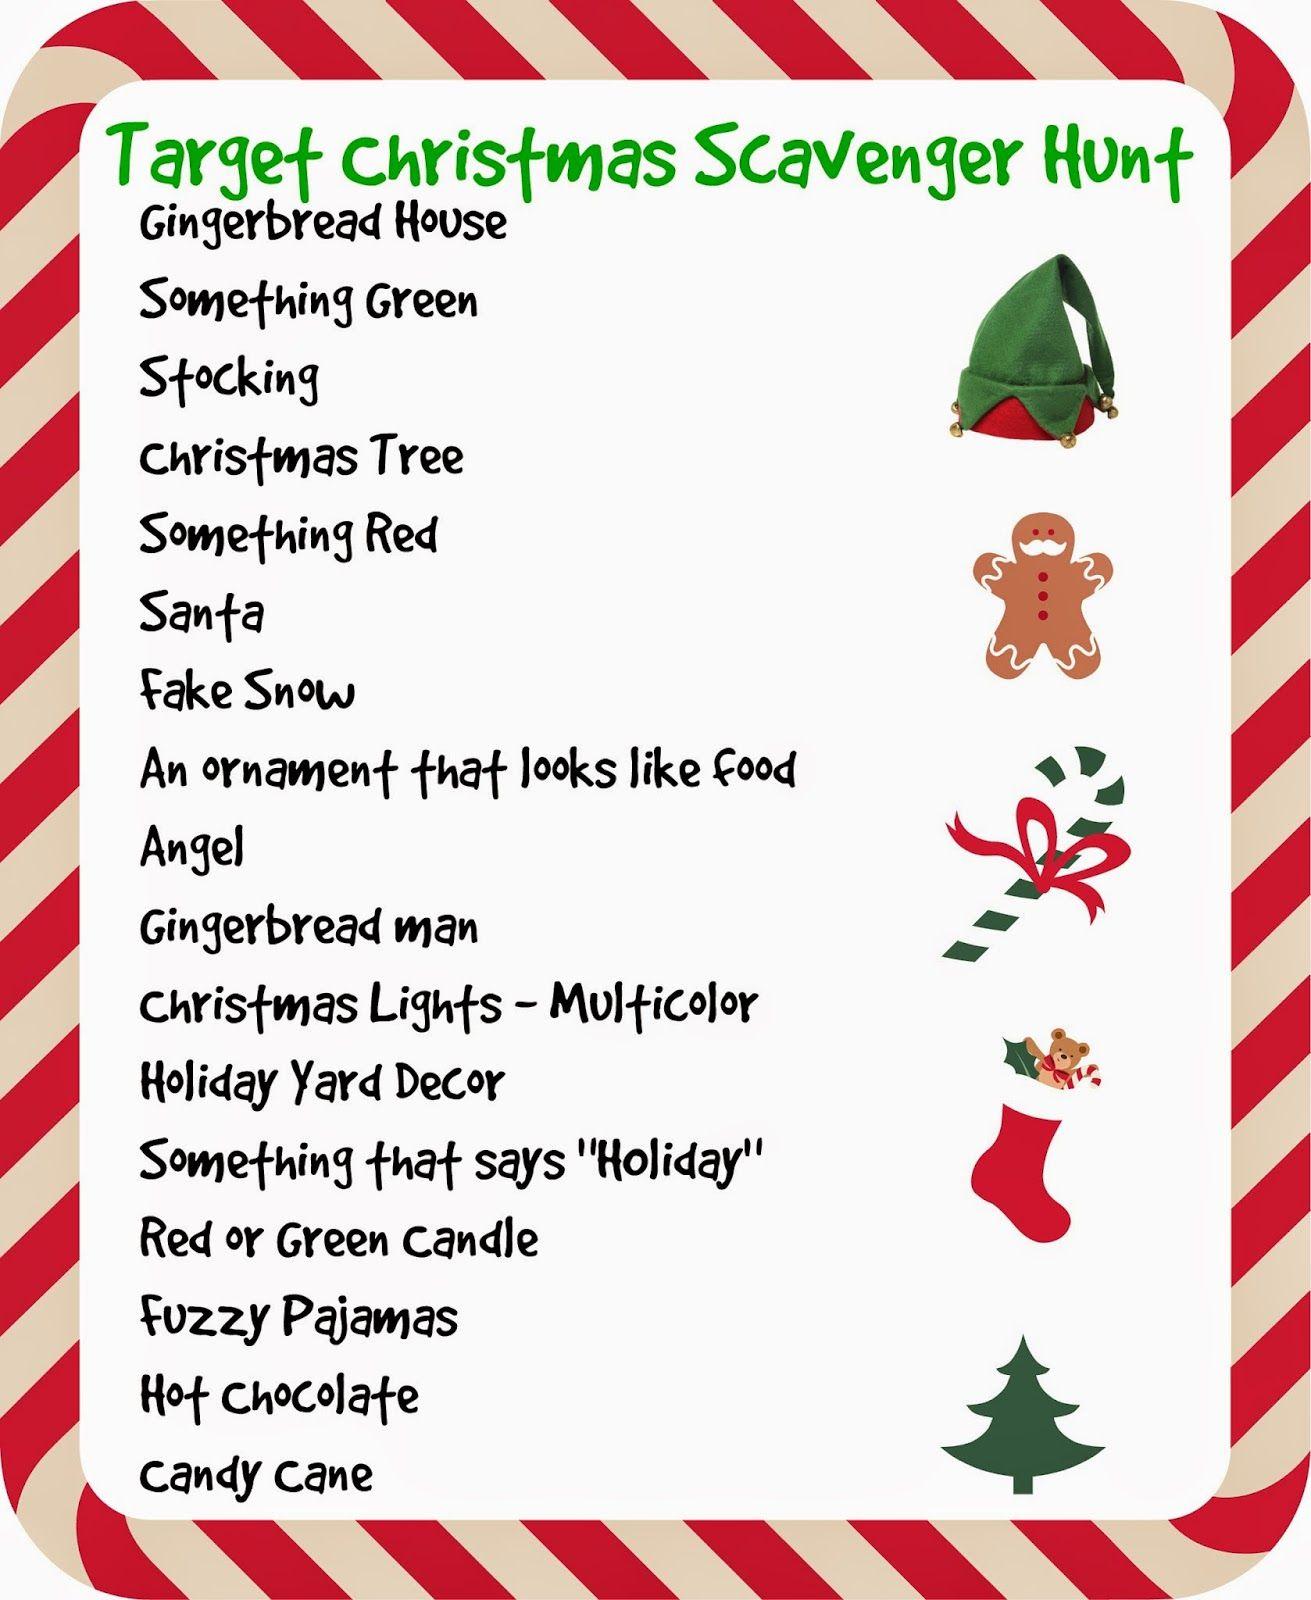 Target Store Christmas Scavenger Hunt Christmas Lights I Spy Links